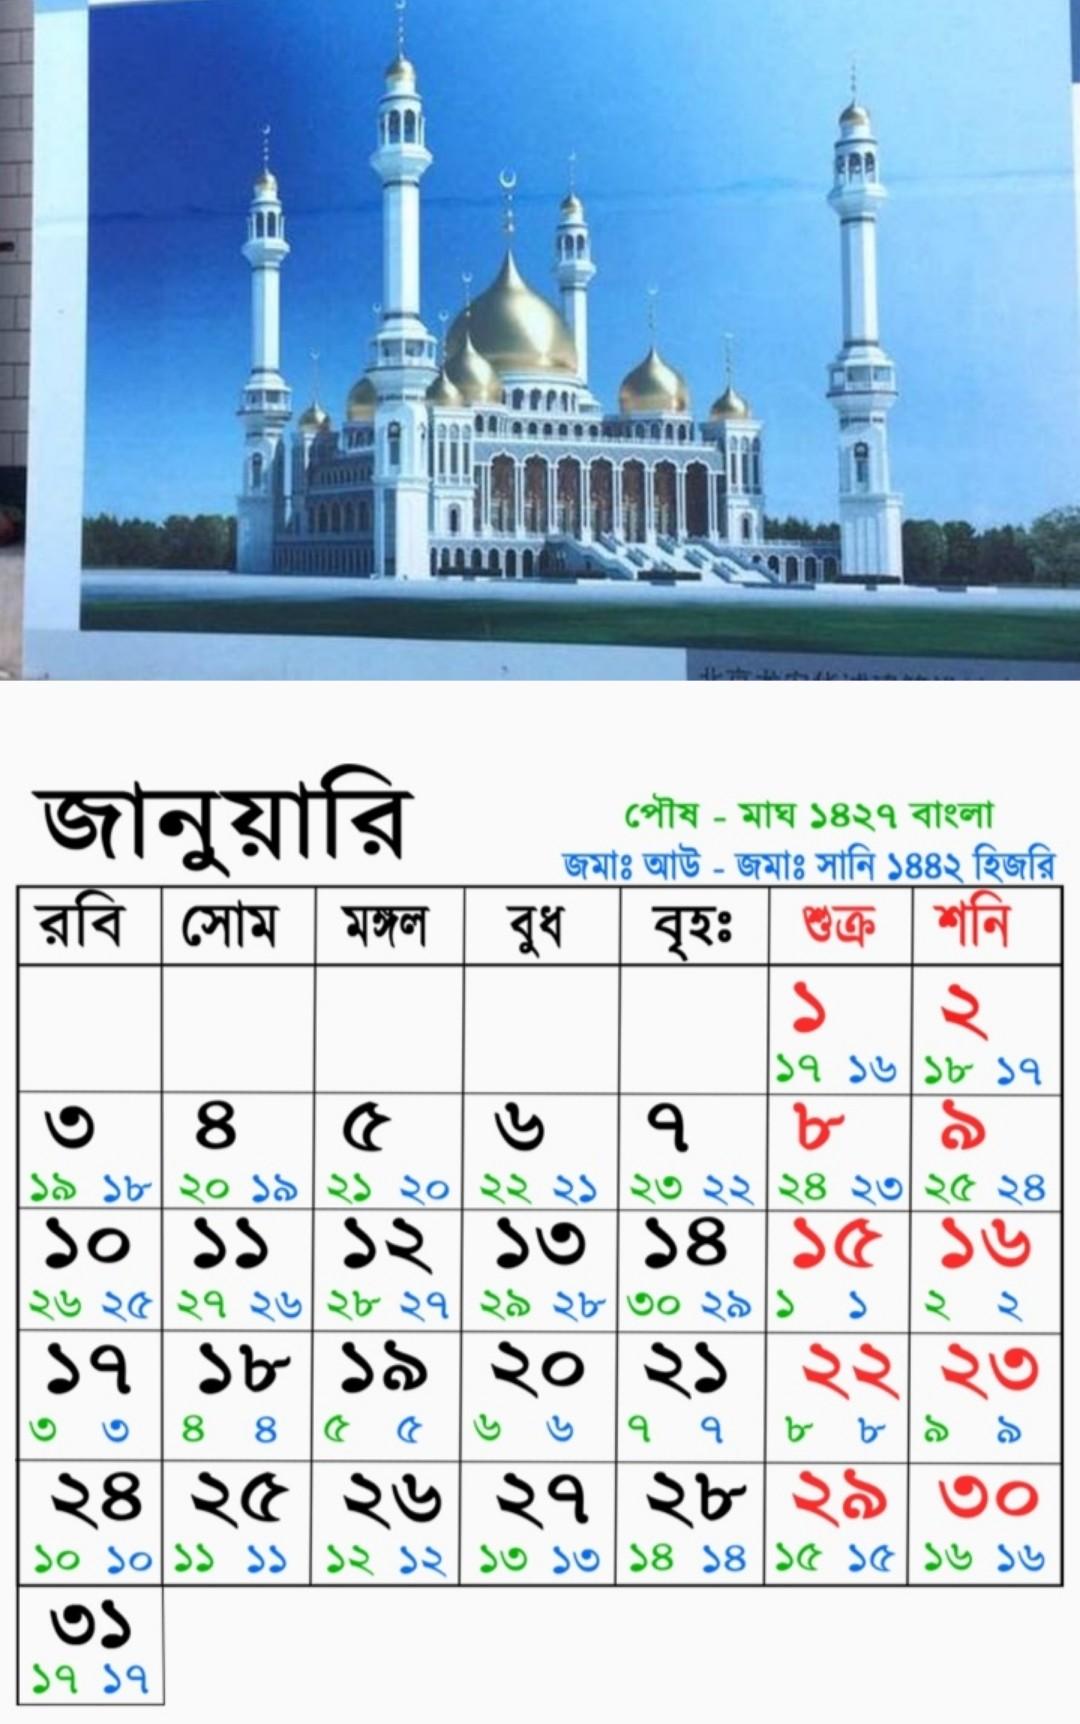 January Bangla English Arabi Calendar 2021 |জানুয়ারি বাংলা ইংরেজি আরবি ক্যালেন্ডার ২০২১ |